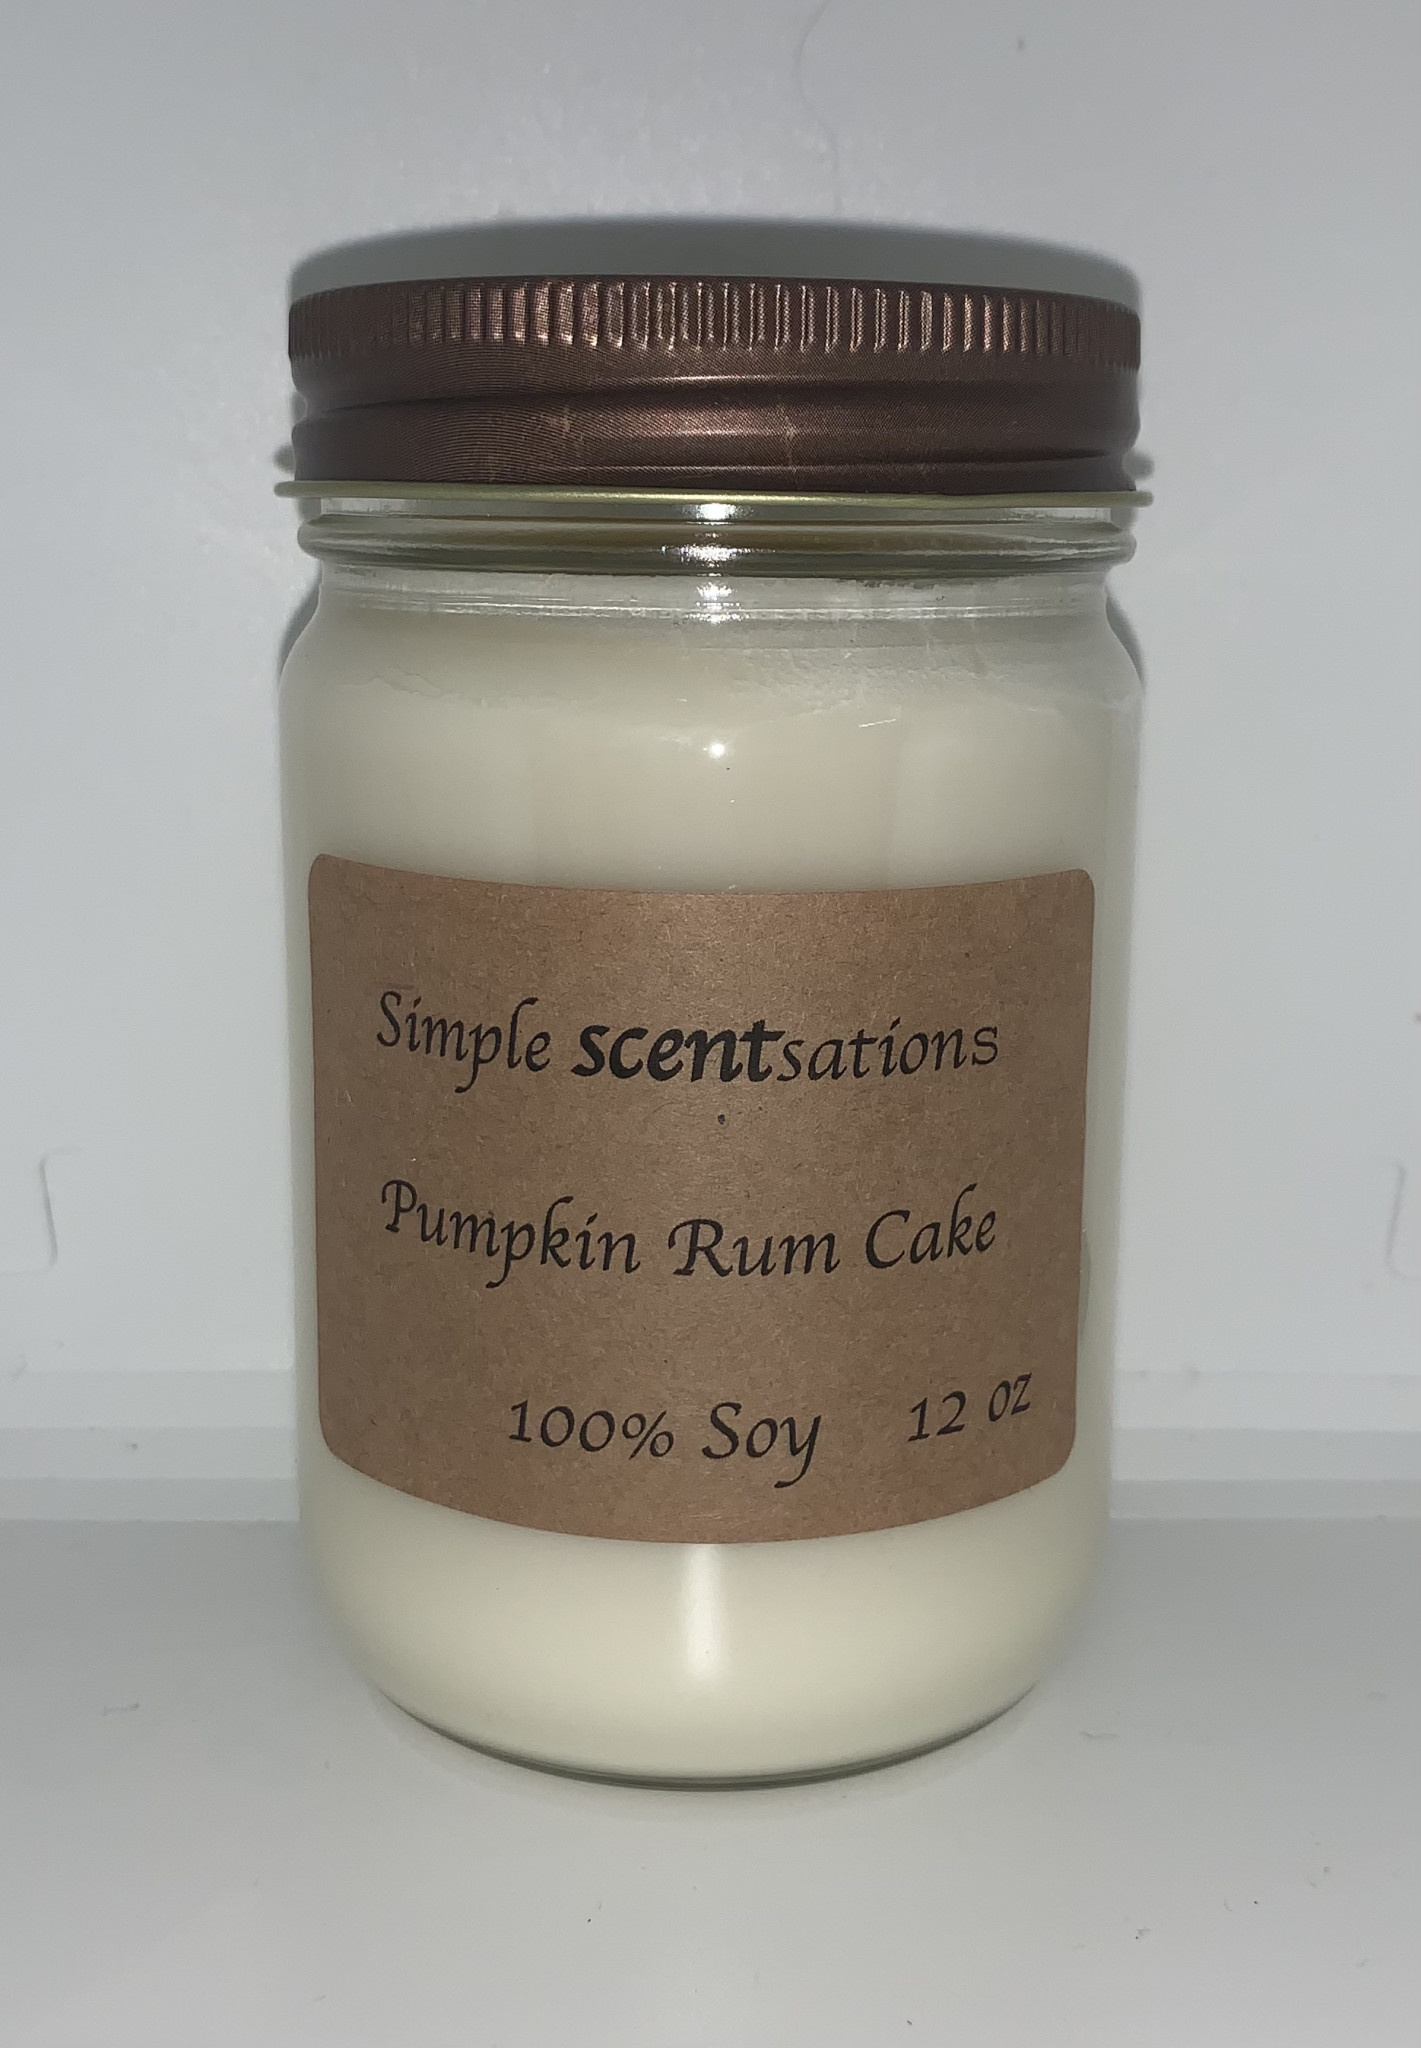 Simple Scentsation Pumpkin Rum Cake 12 oz Soy Candle